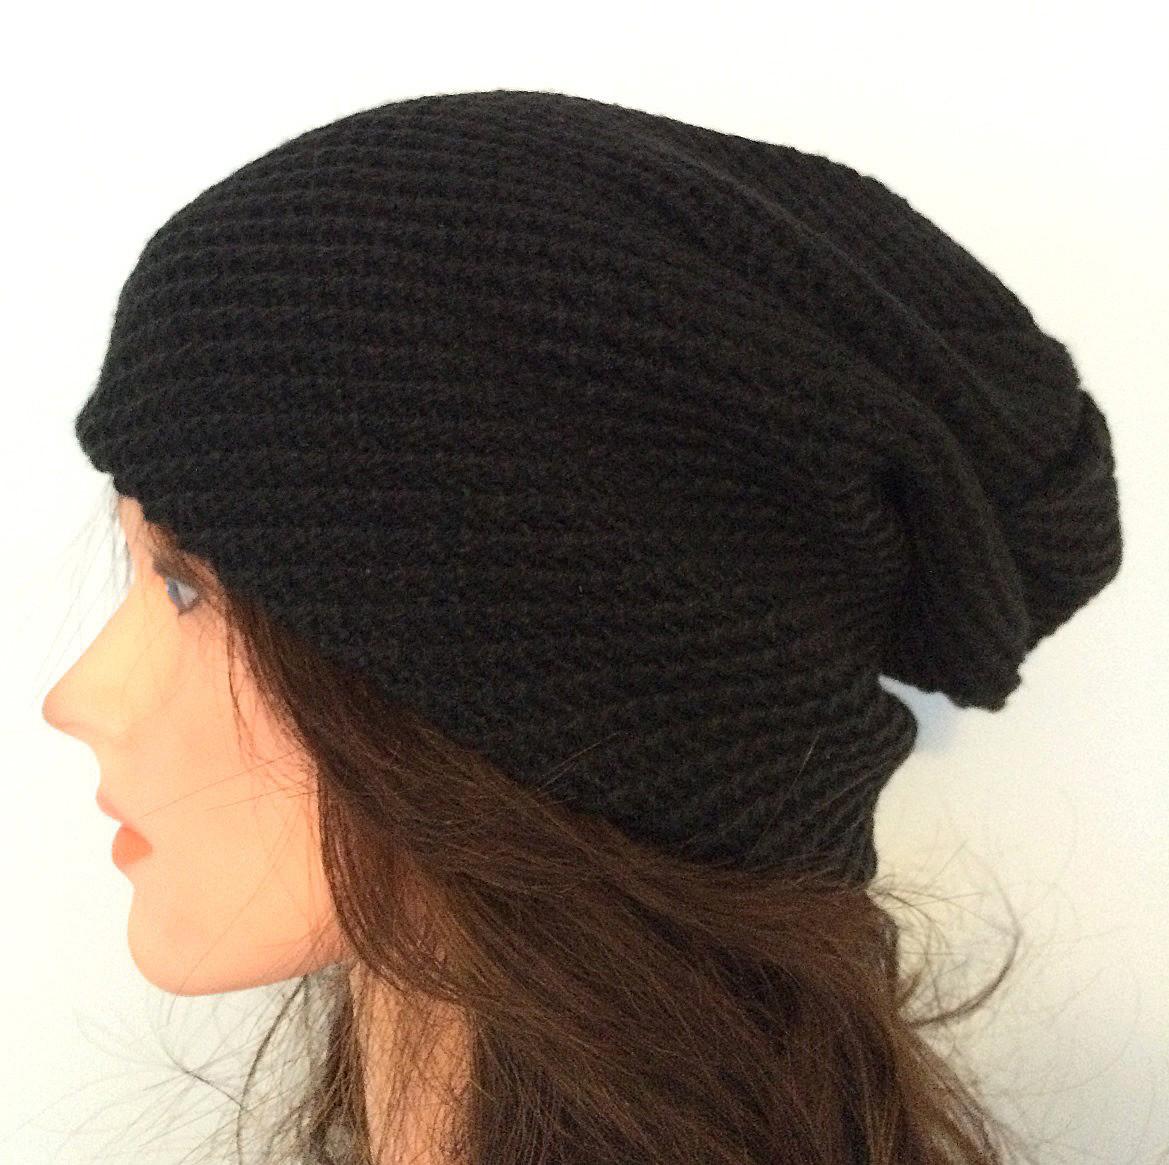 Black slouchy hat/beret